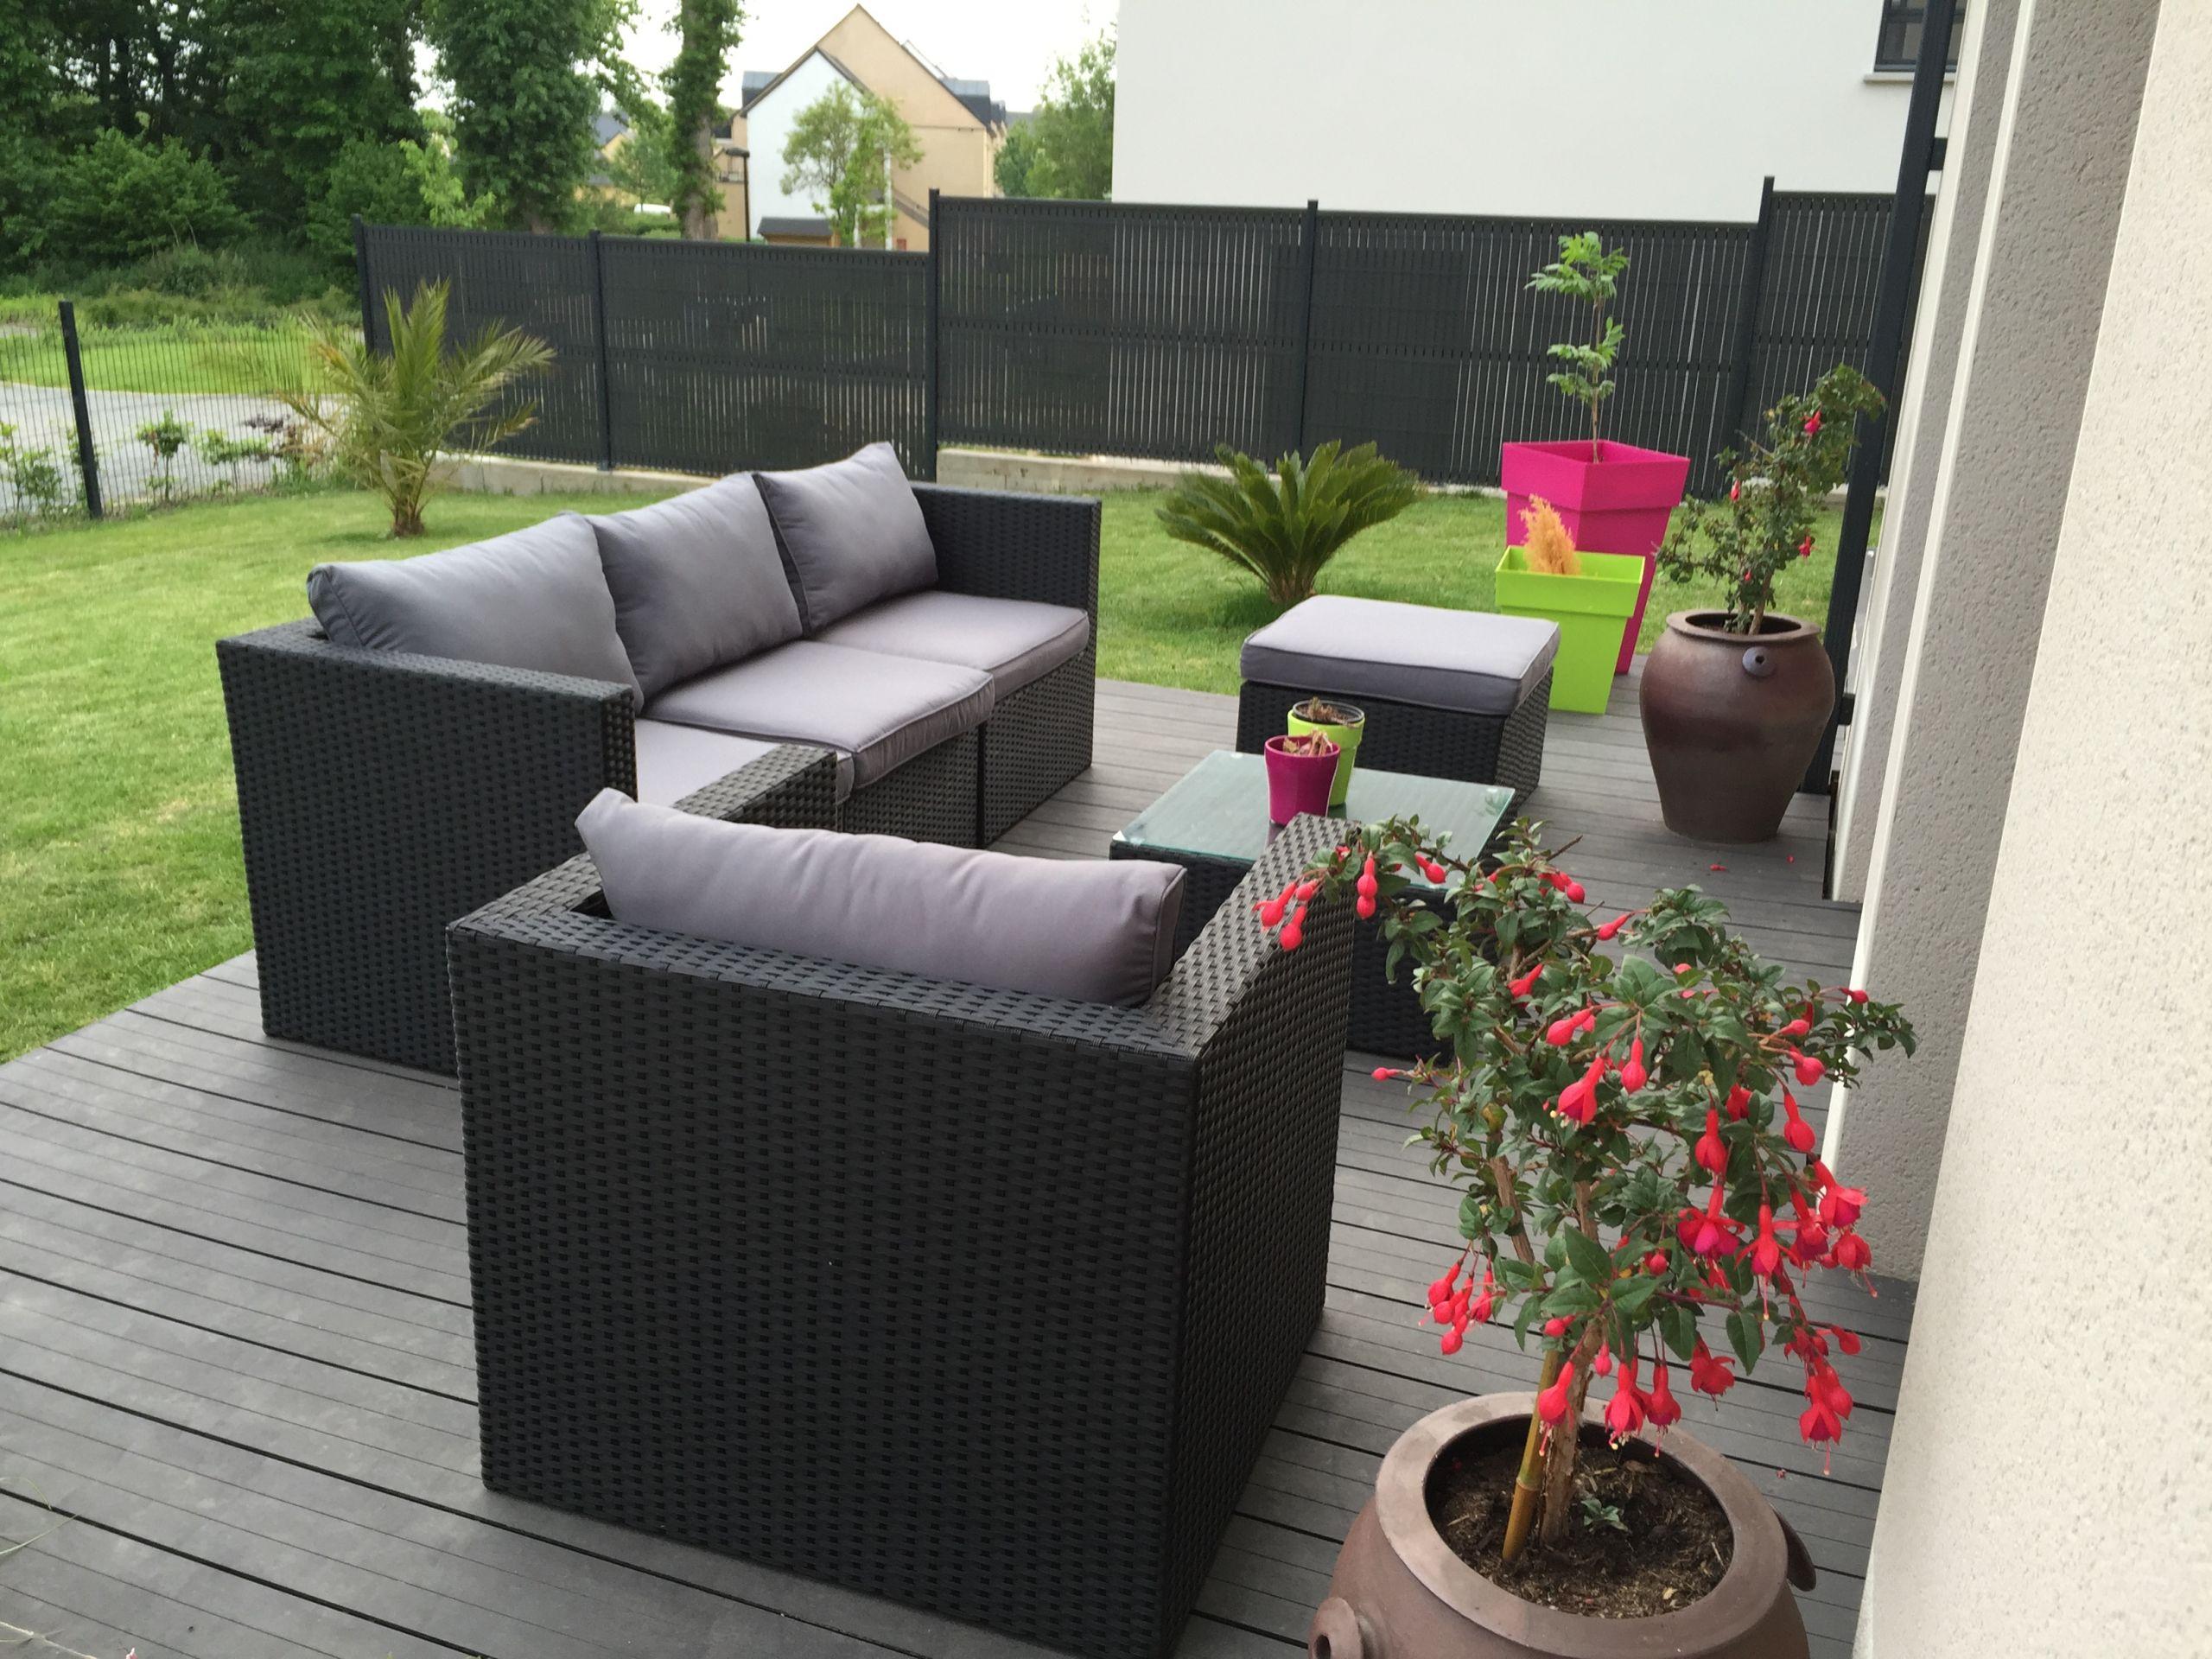 26 Élégant Table De Jardin Resine | Salon Jardin pour Mobilier De Jardin Ikea